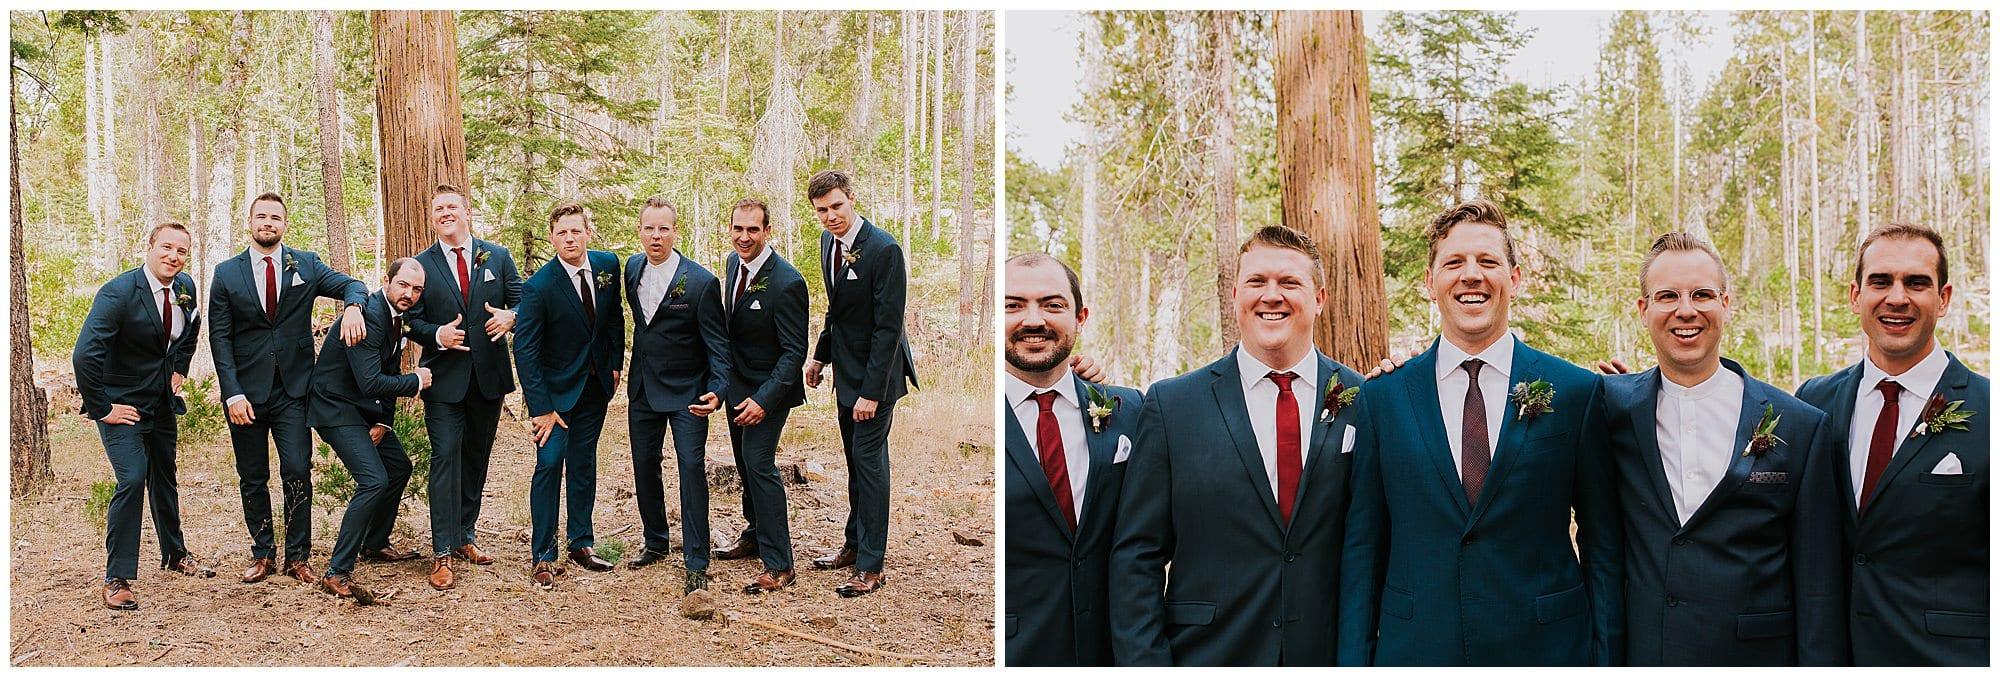 groom and groomsmen portrait before wedding